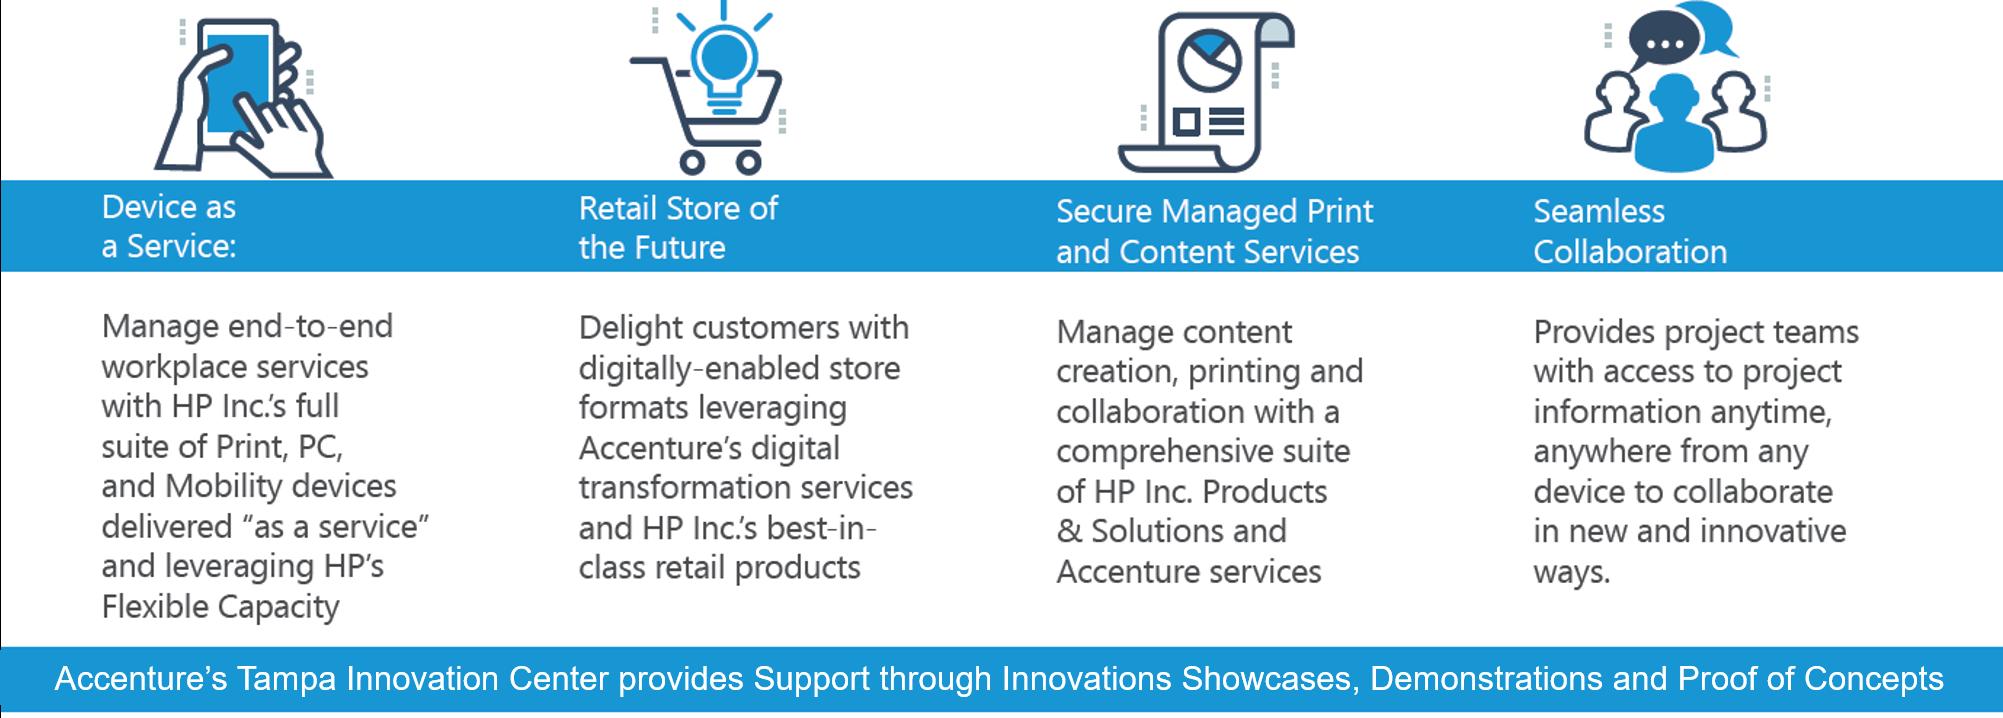 HP Inc Alliance - Accenture